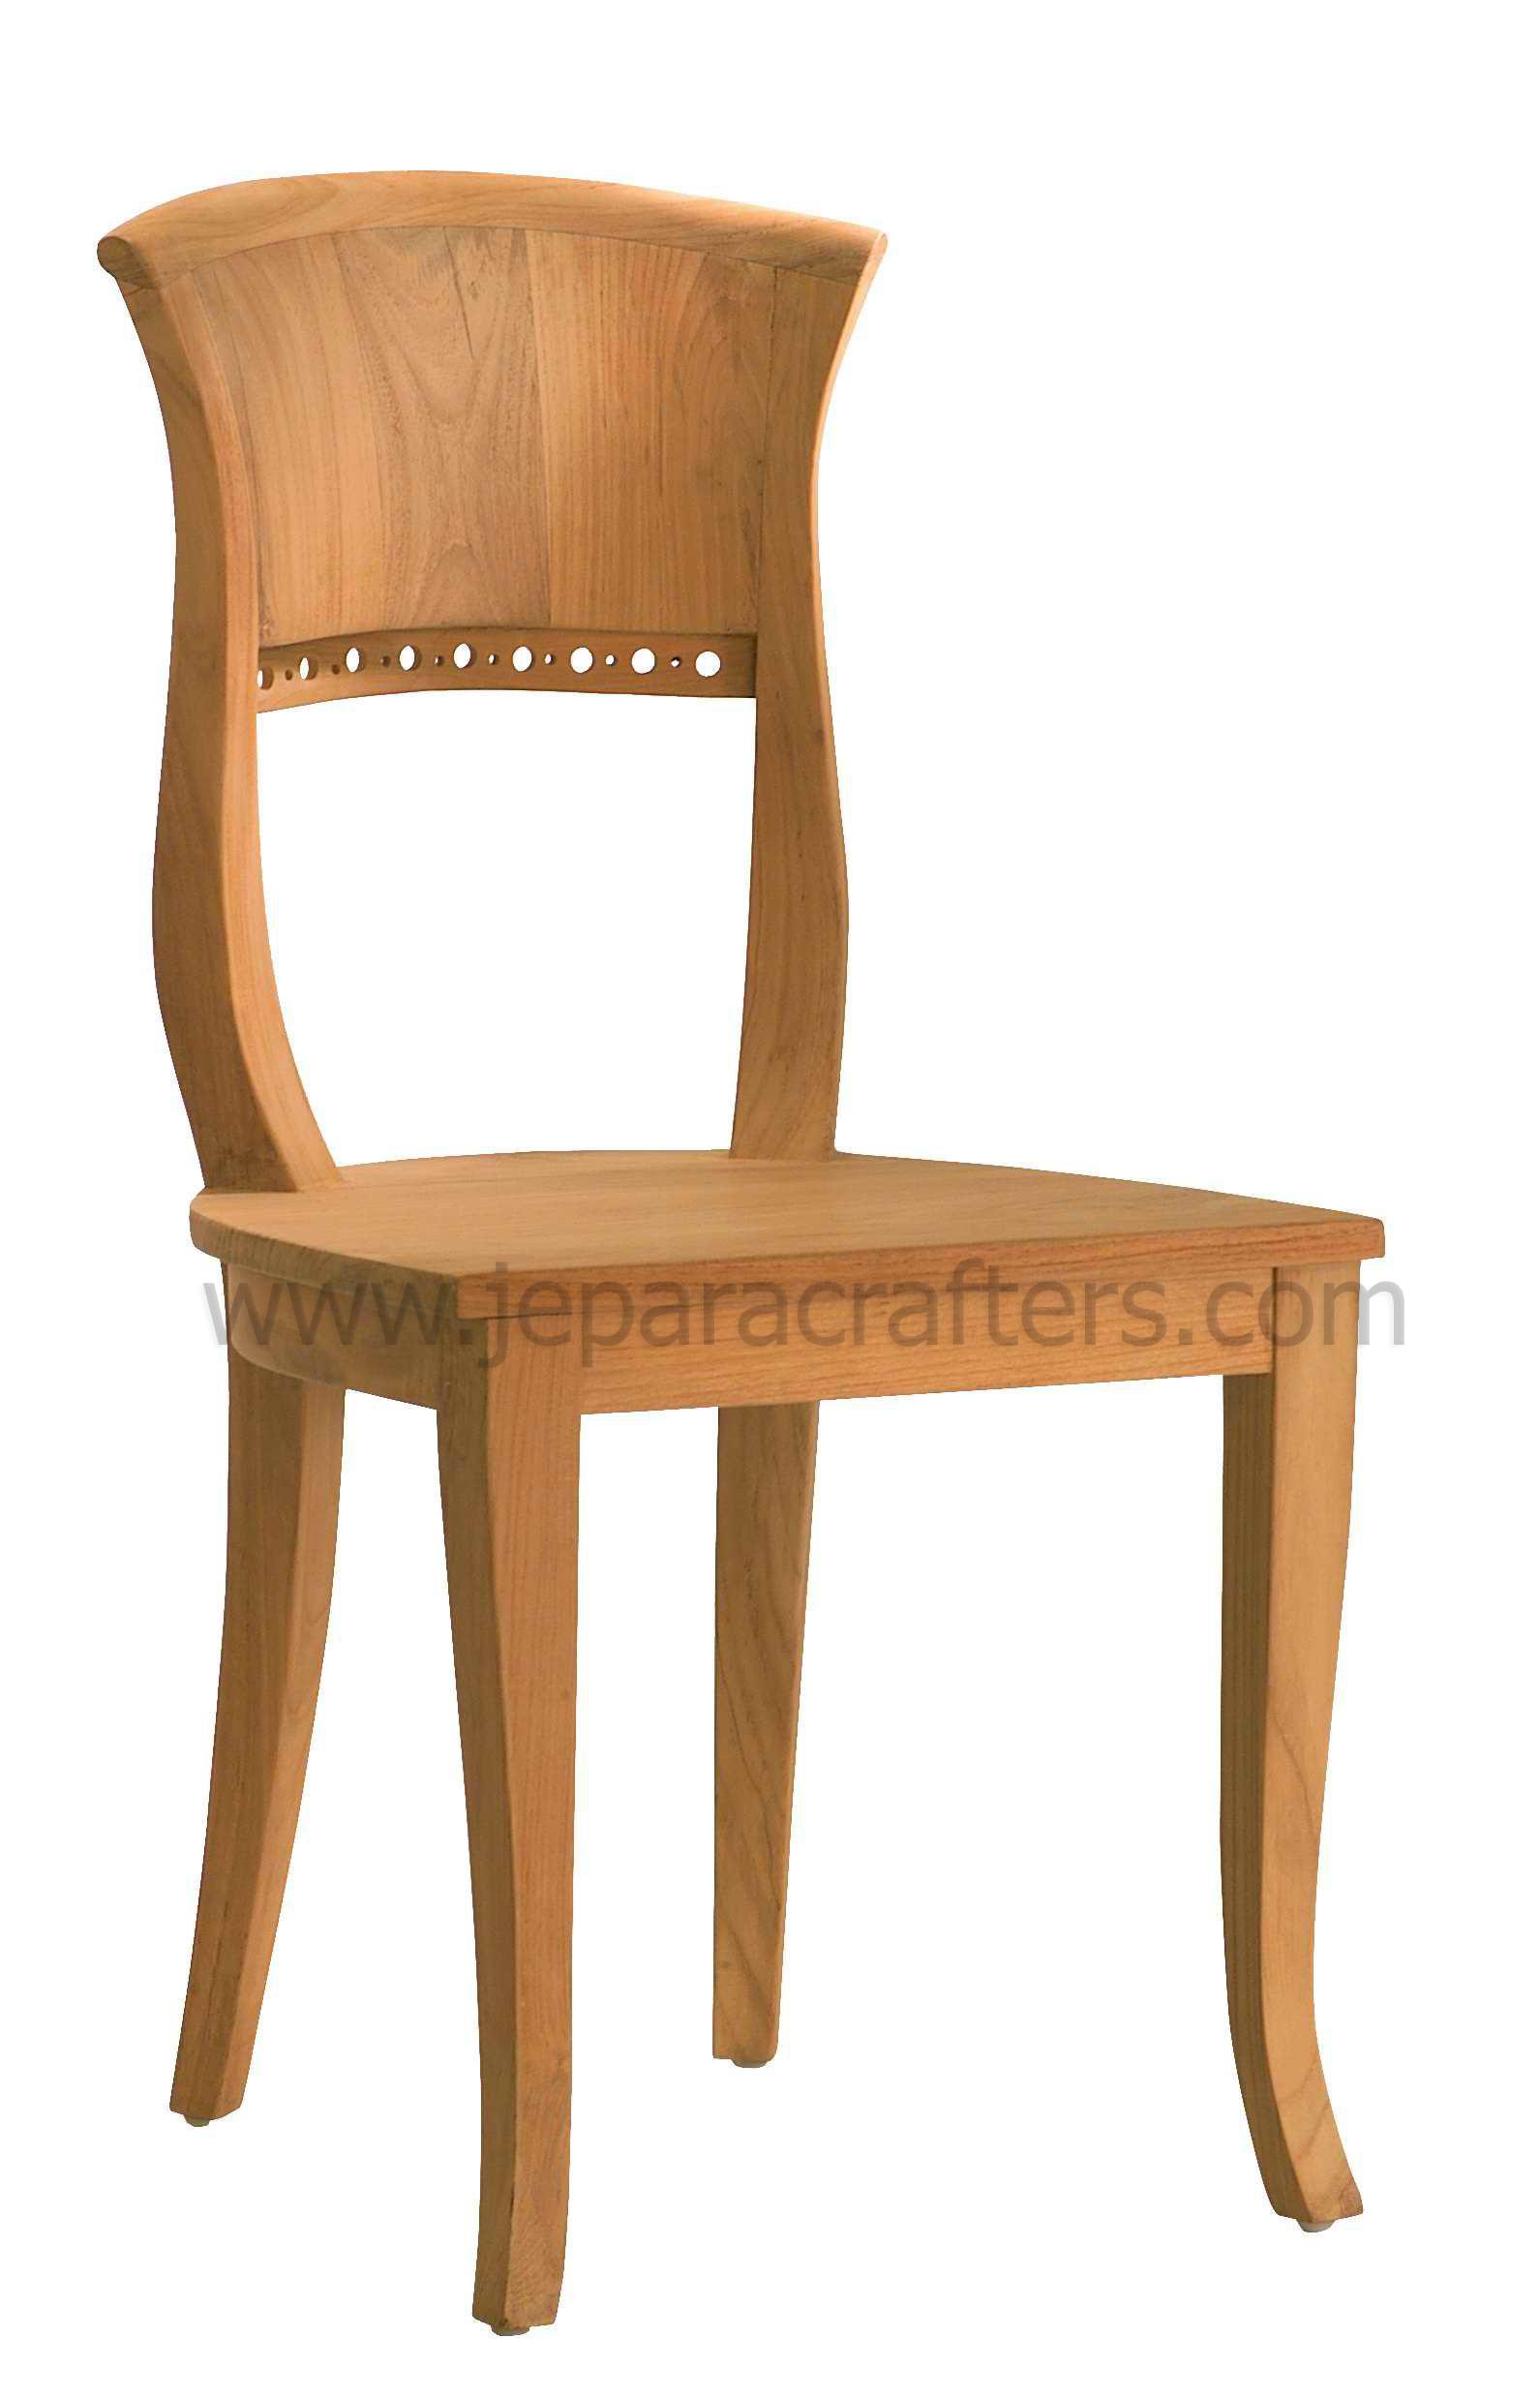 Excellent Antique Teak Dining Chairs 1591 x 2478 · 286 kB · jpeg